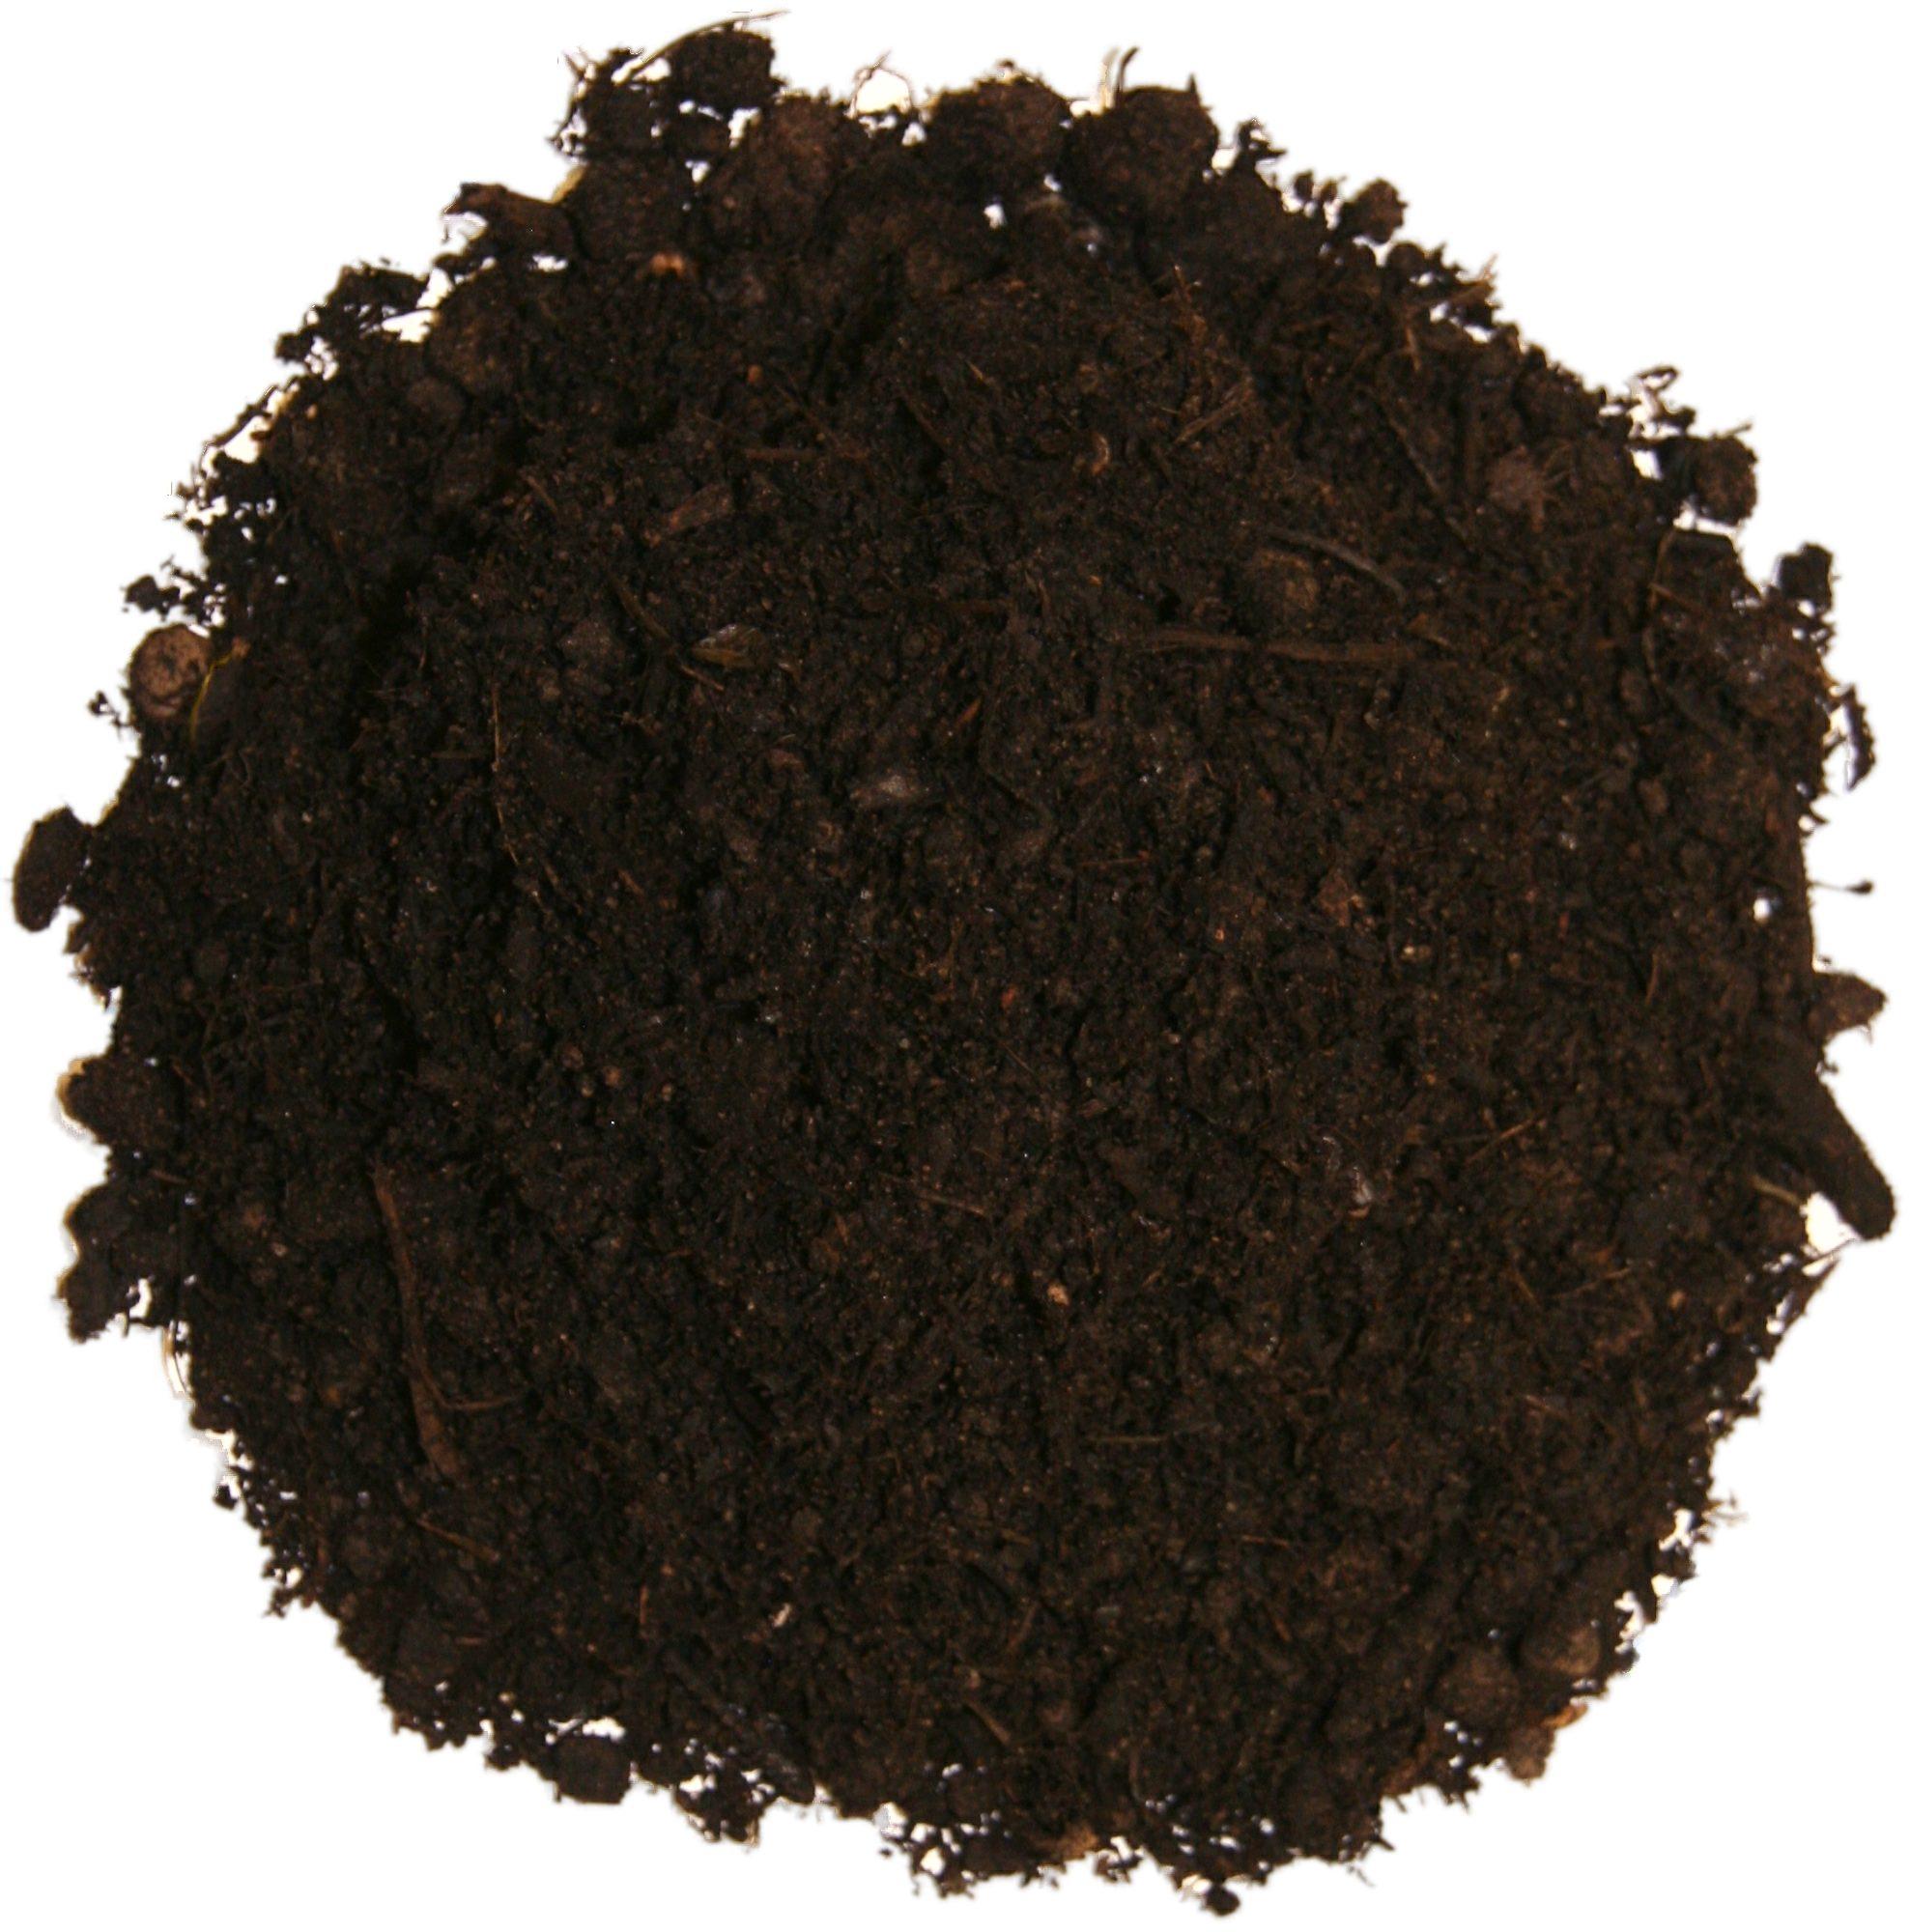 Veggie Gold Compost Compost Direct Ltd Compost Direct